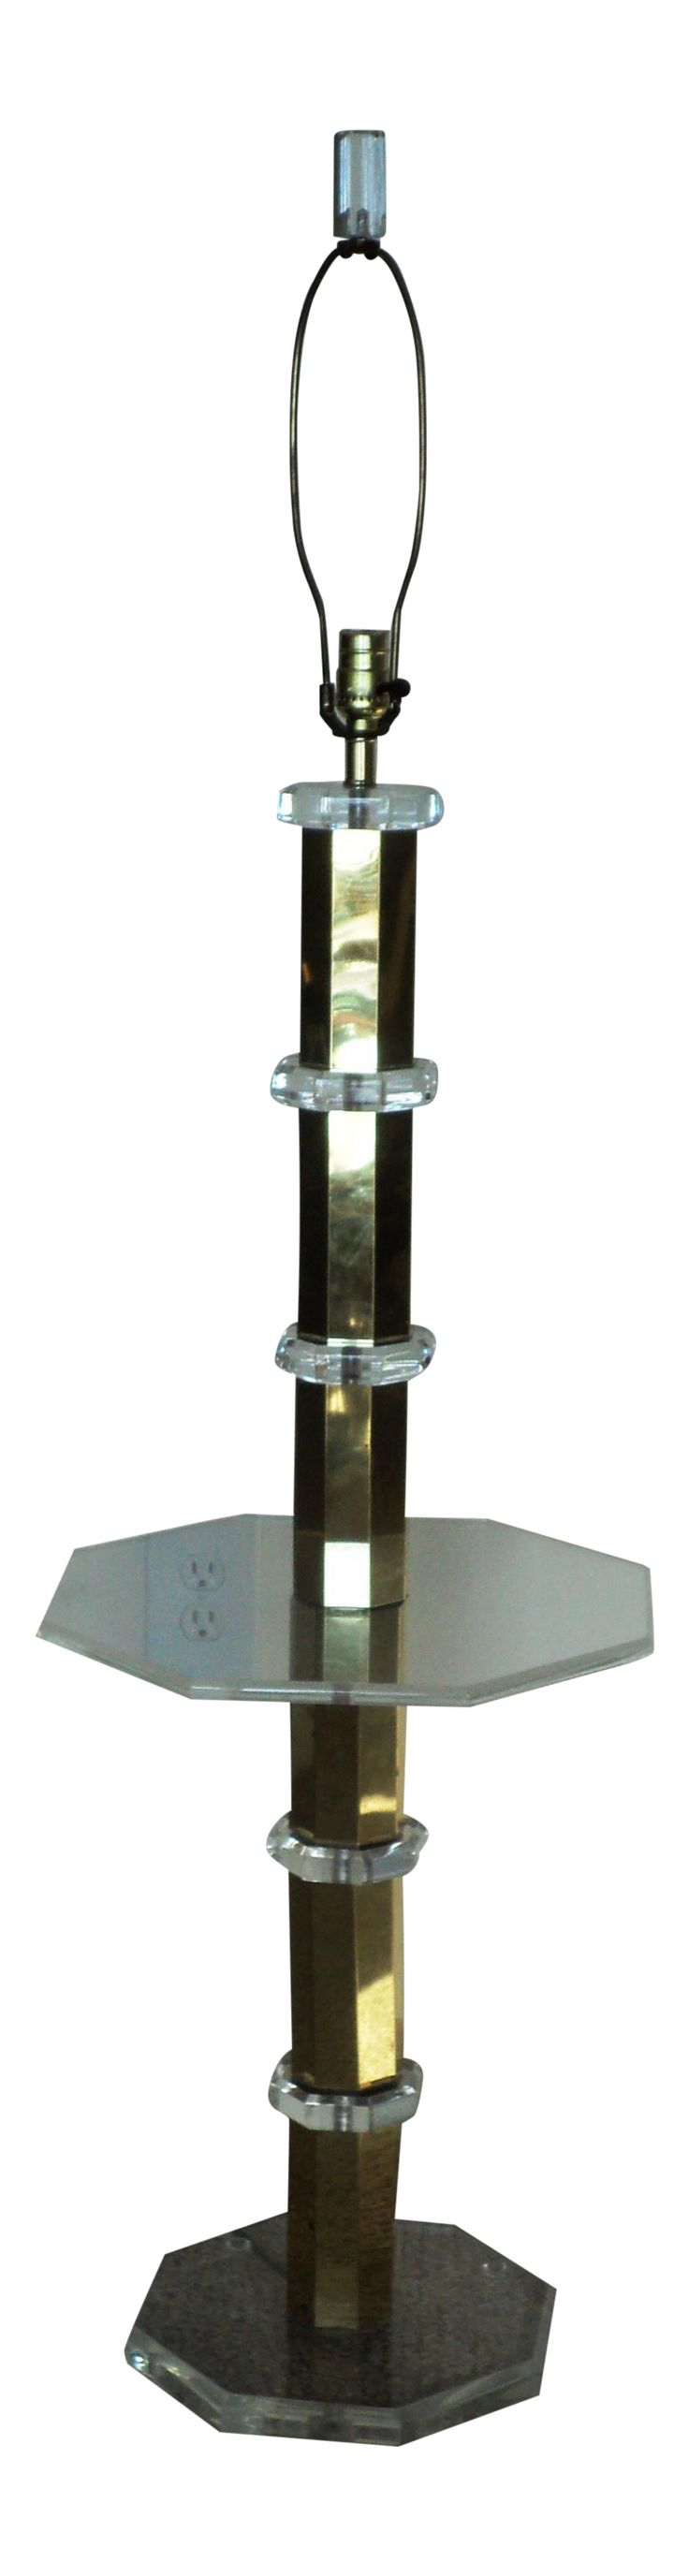 hollywood glam lucite u0026 gold floor lamp - Gold Floor Lamp